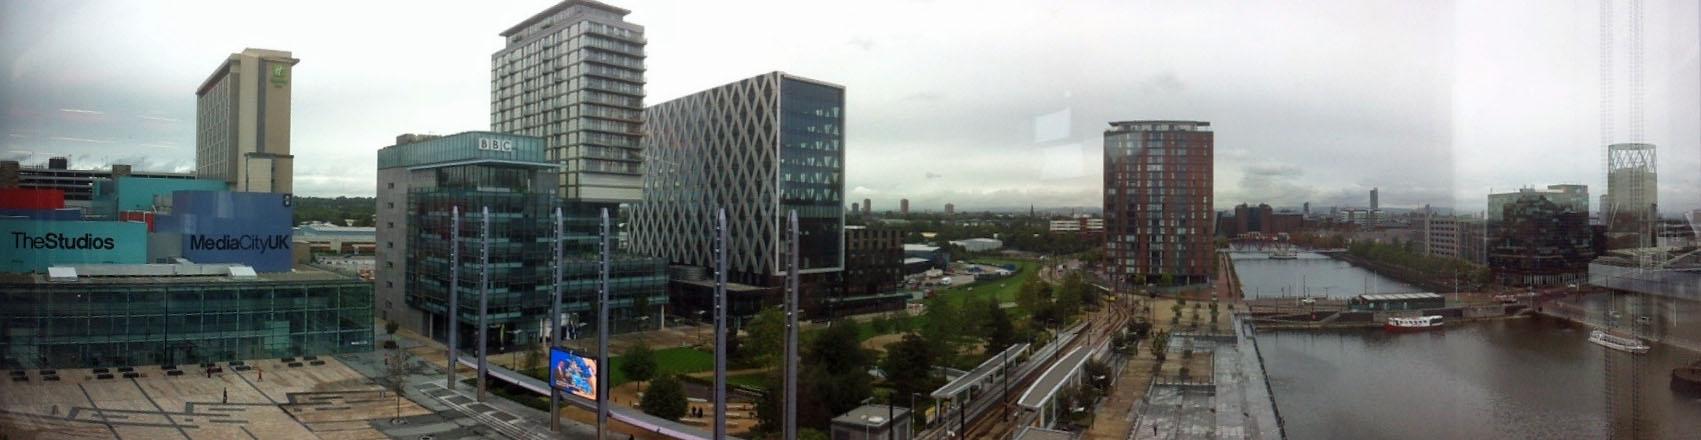 Imposante Anlage: MediaCity Manchester